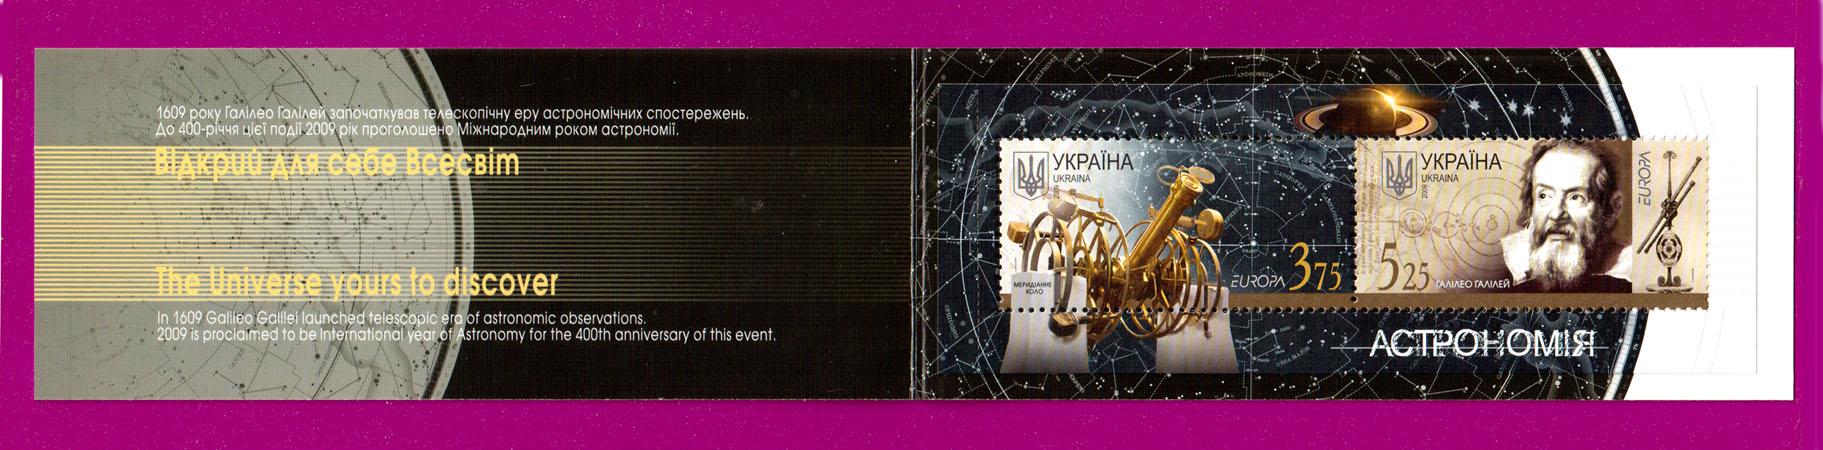 2009 N992-993 (b77) буклет N10 Астрономия Галилео Галилей космос Европа CEPT Украина